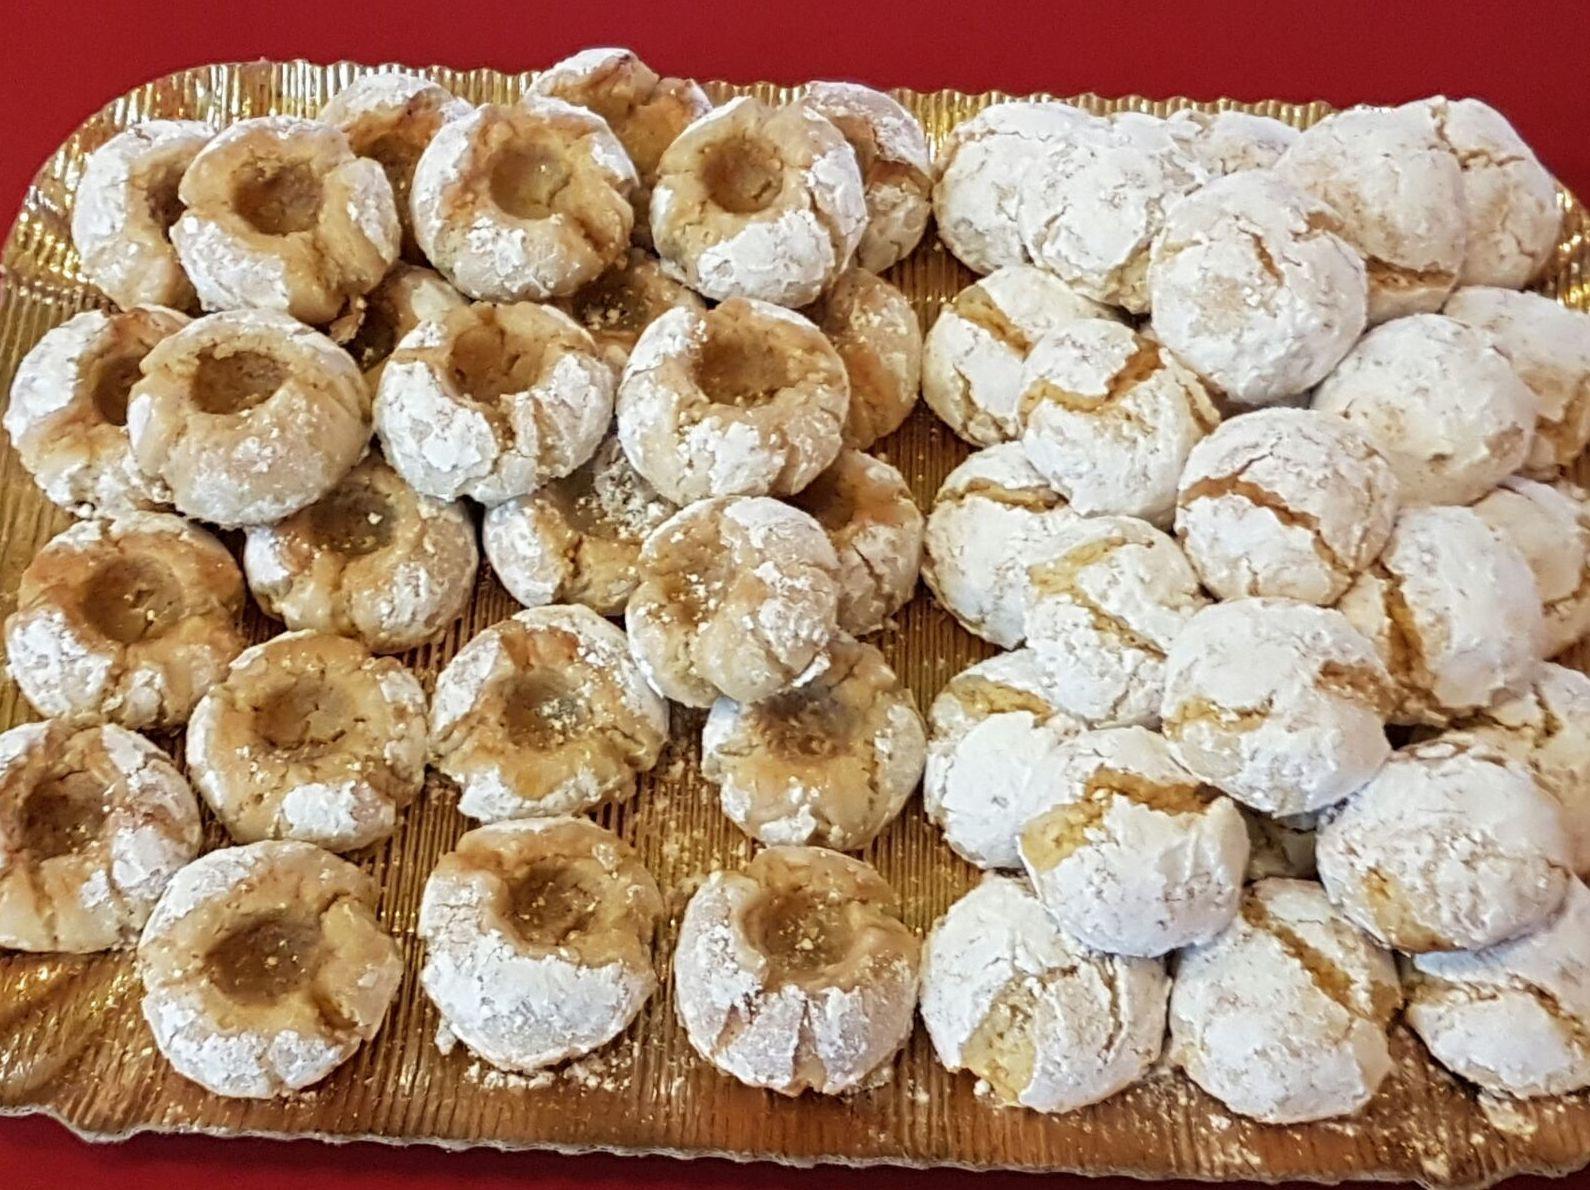 Panellets de mazapán y azúcar